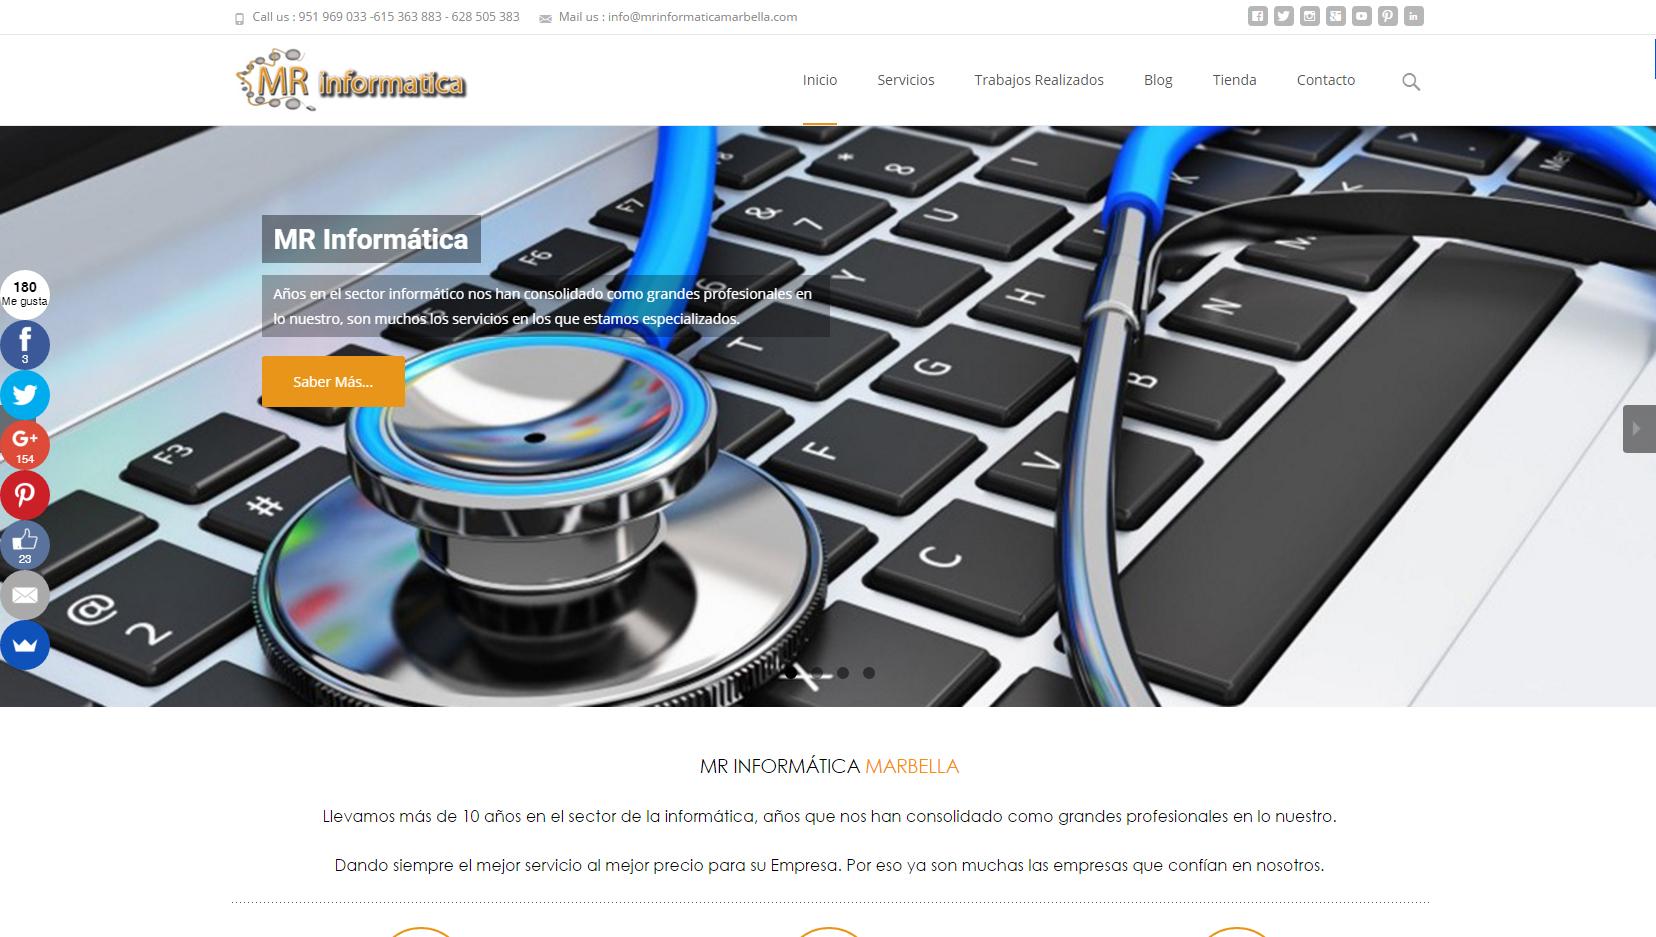 Web_MRInformatica_Marbella WEB Desing